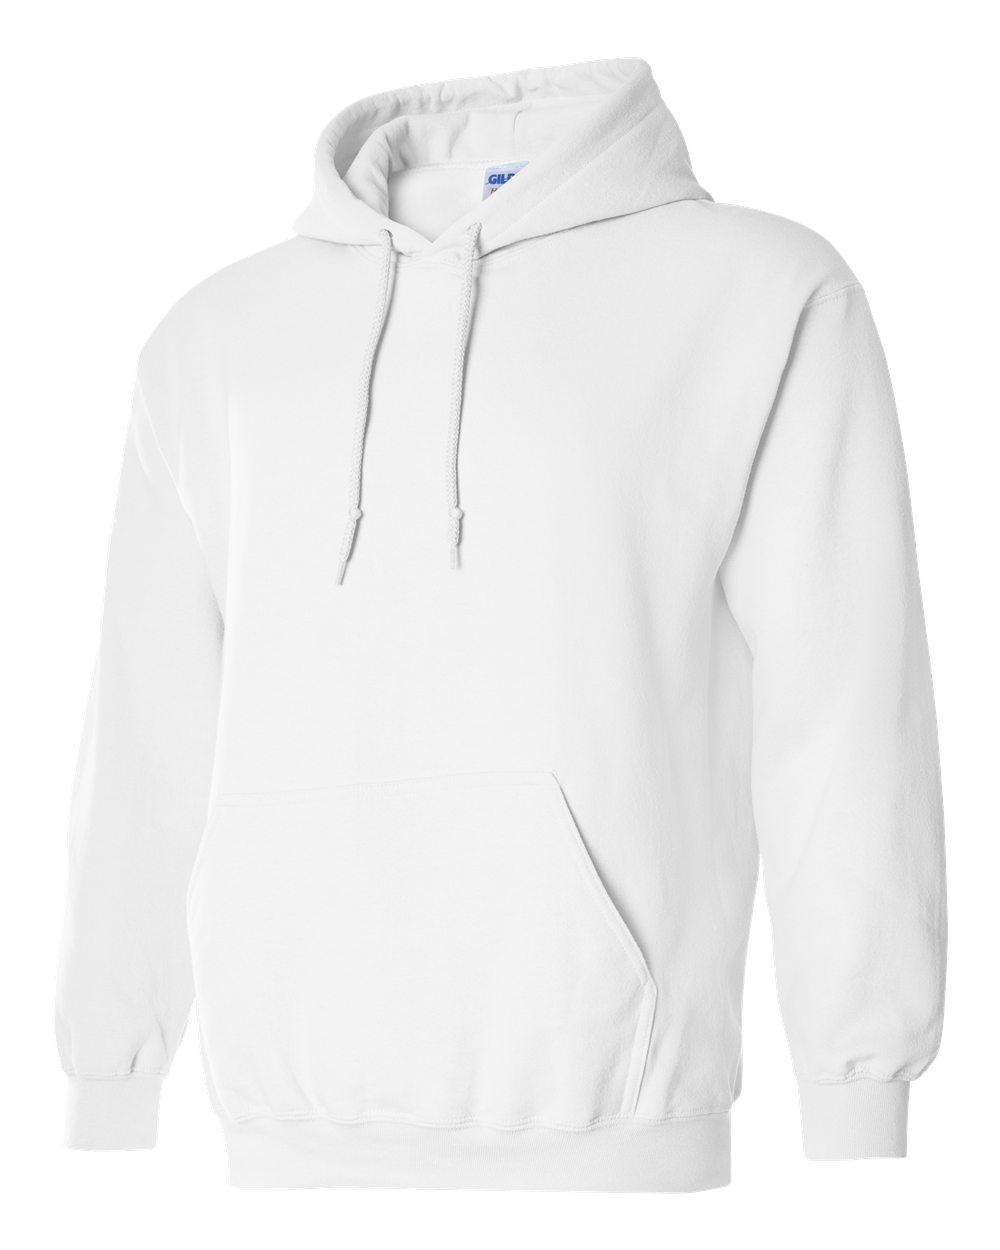 GI18500 White